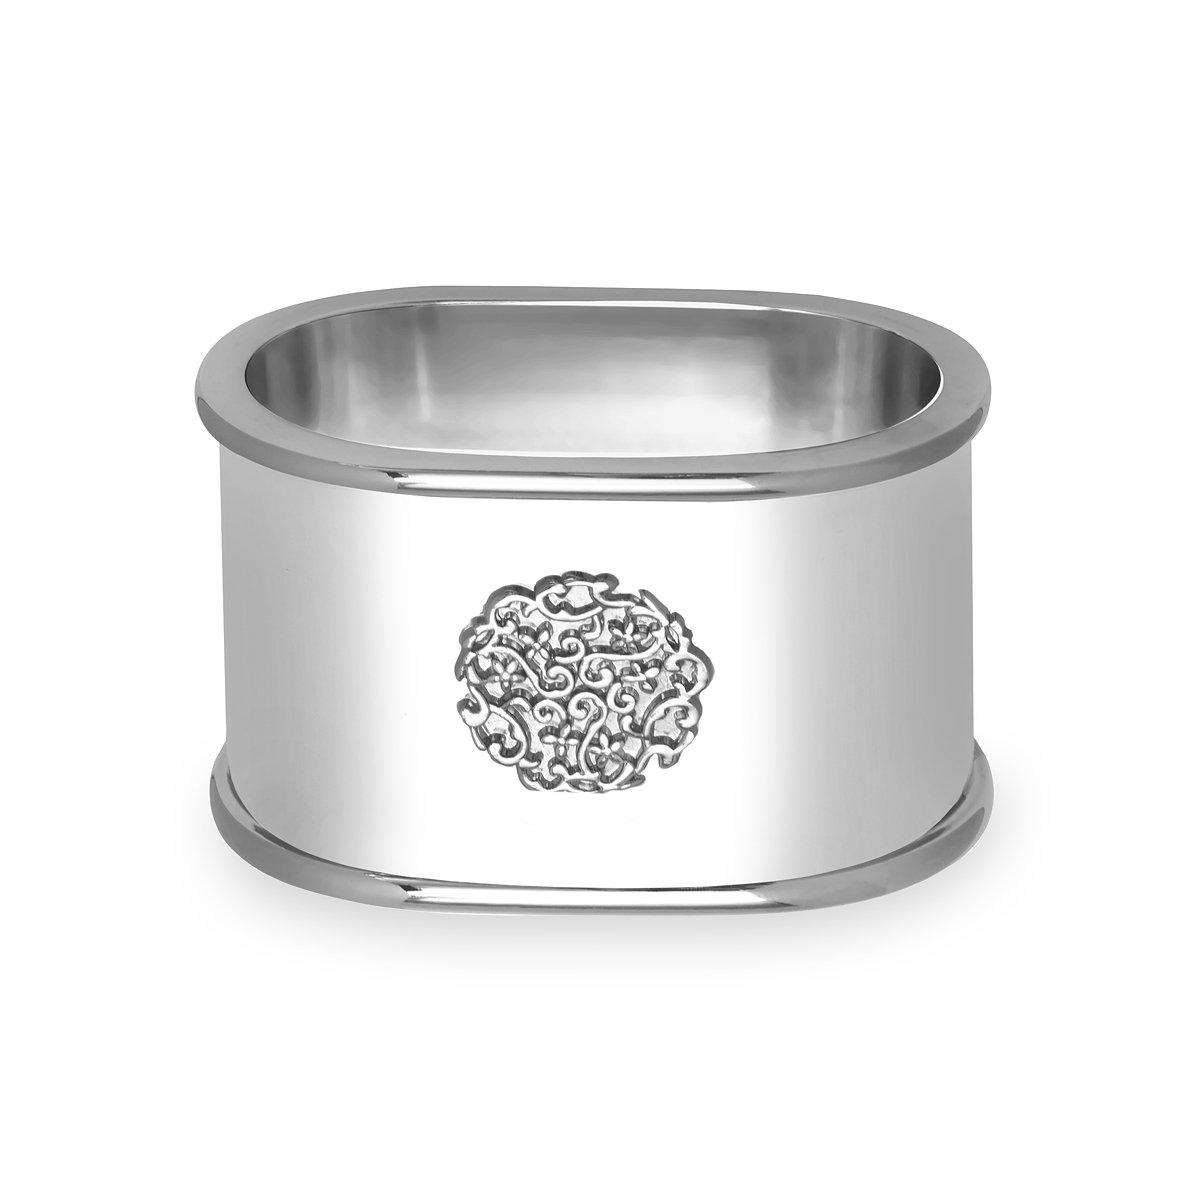 Cachet by Sferra - S/4 Napkin Ring (Silver)